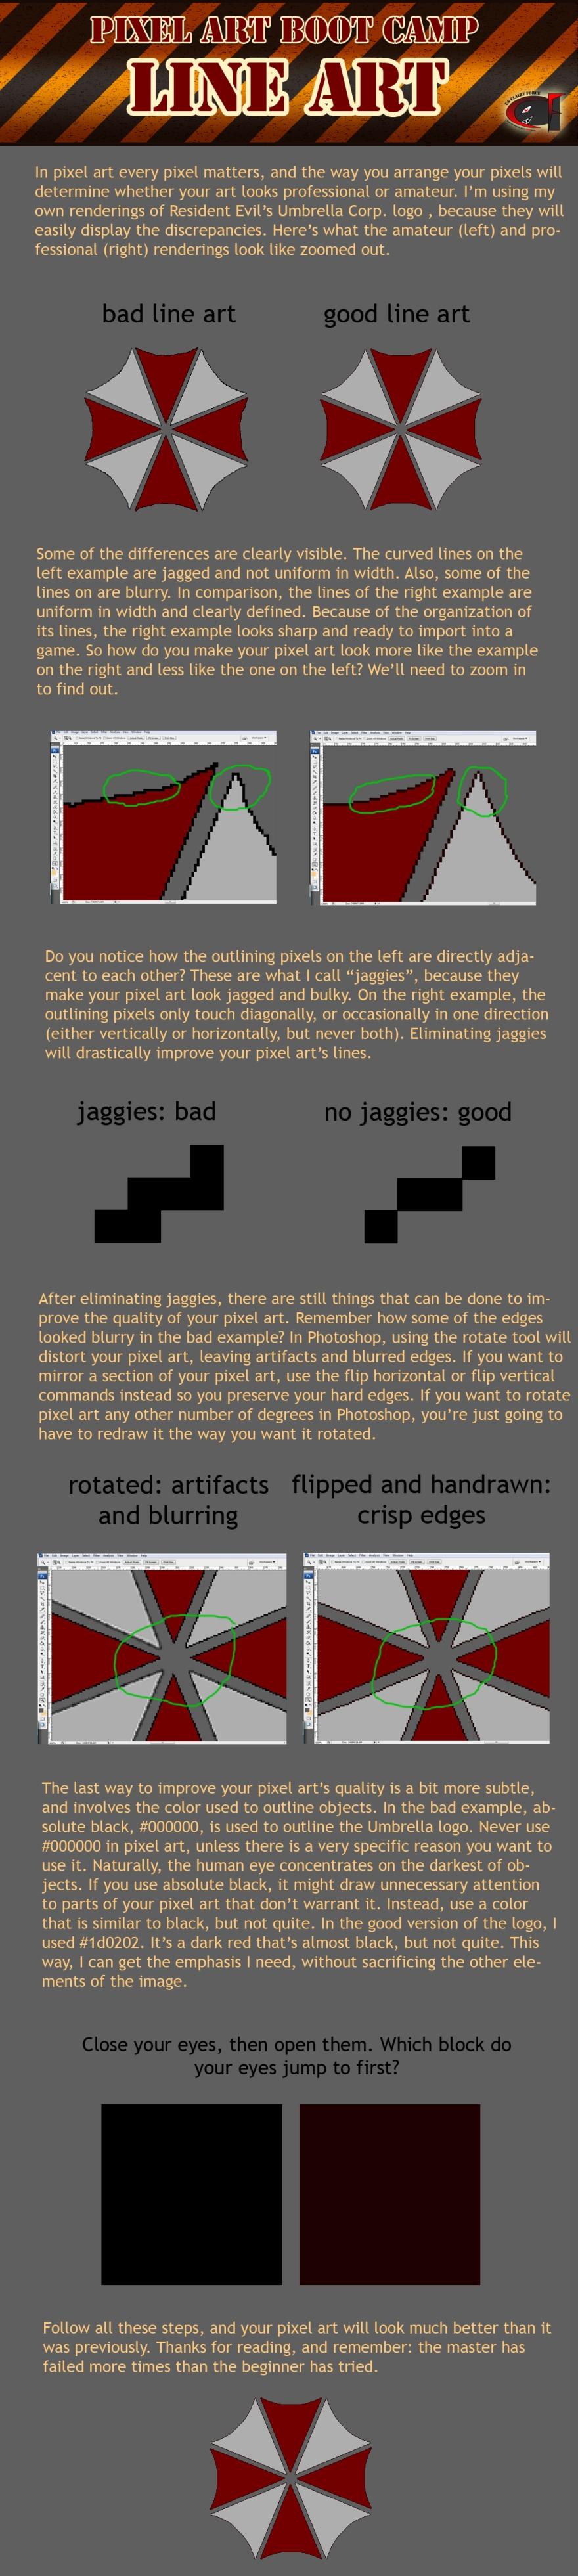 perfecting your pixel art